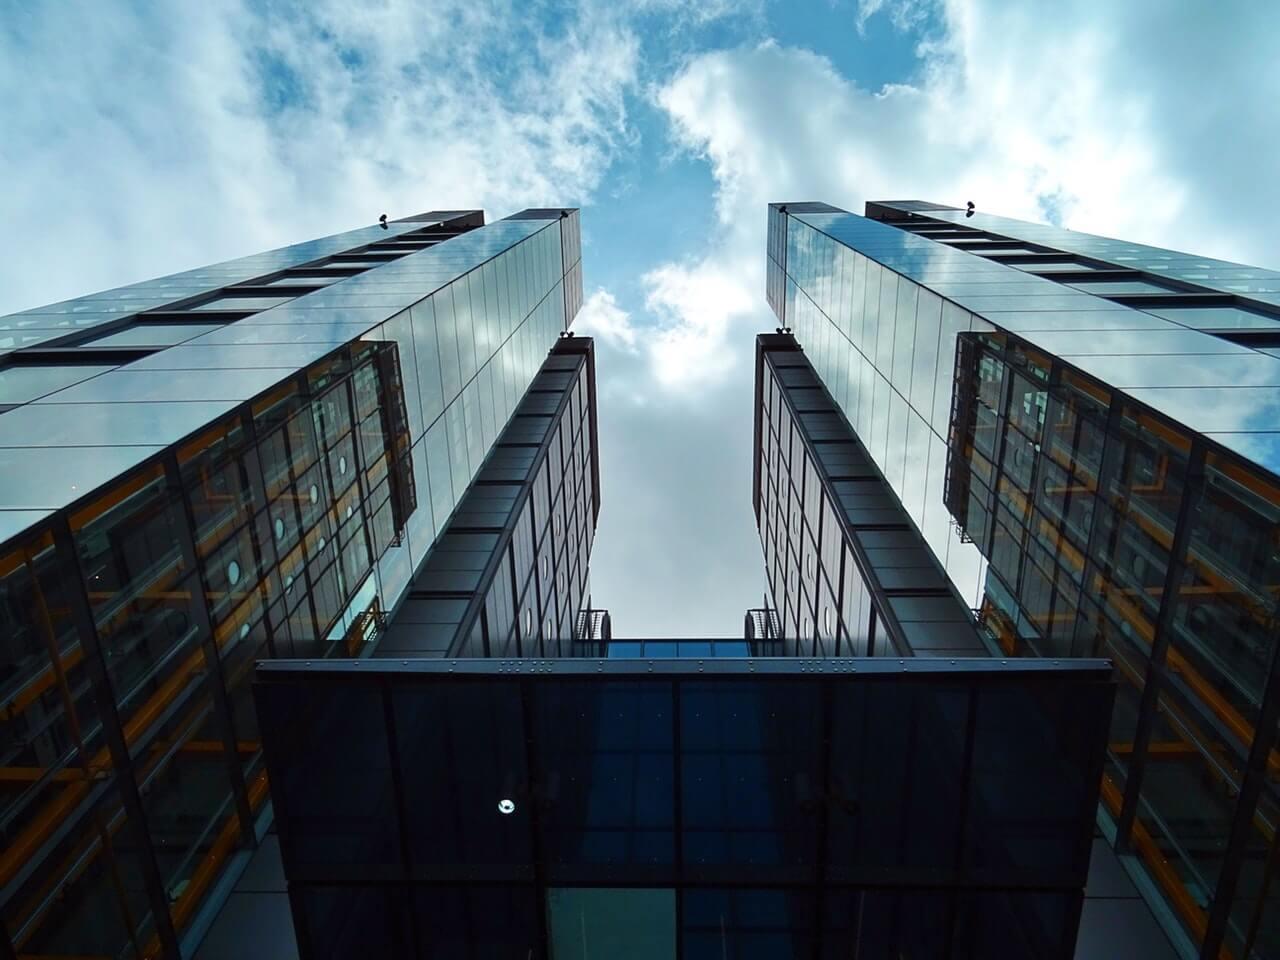 architectural-design-architecture-blue-sky-building-443378